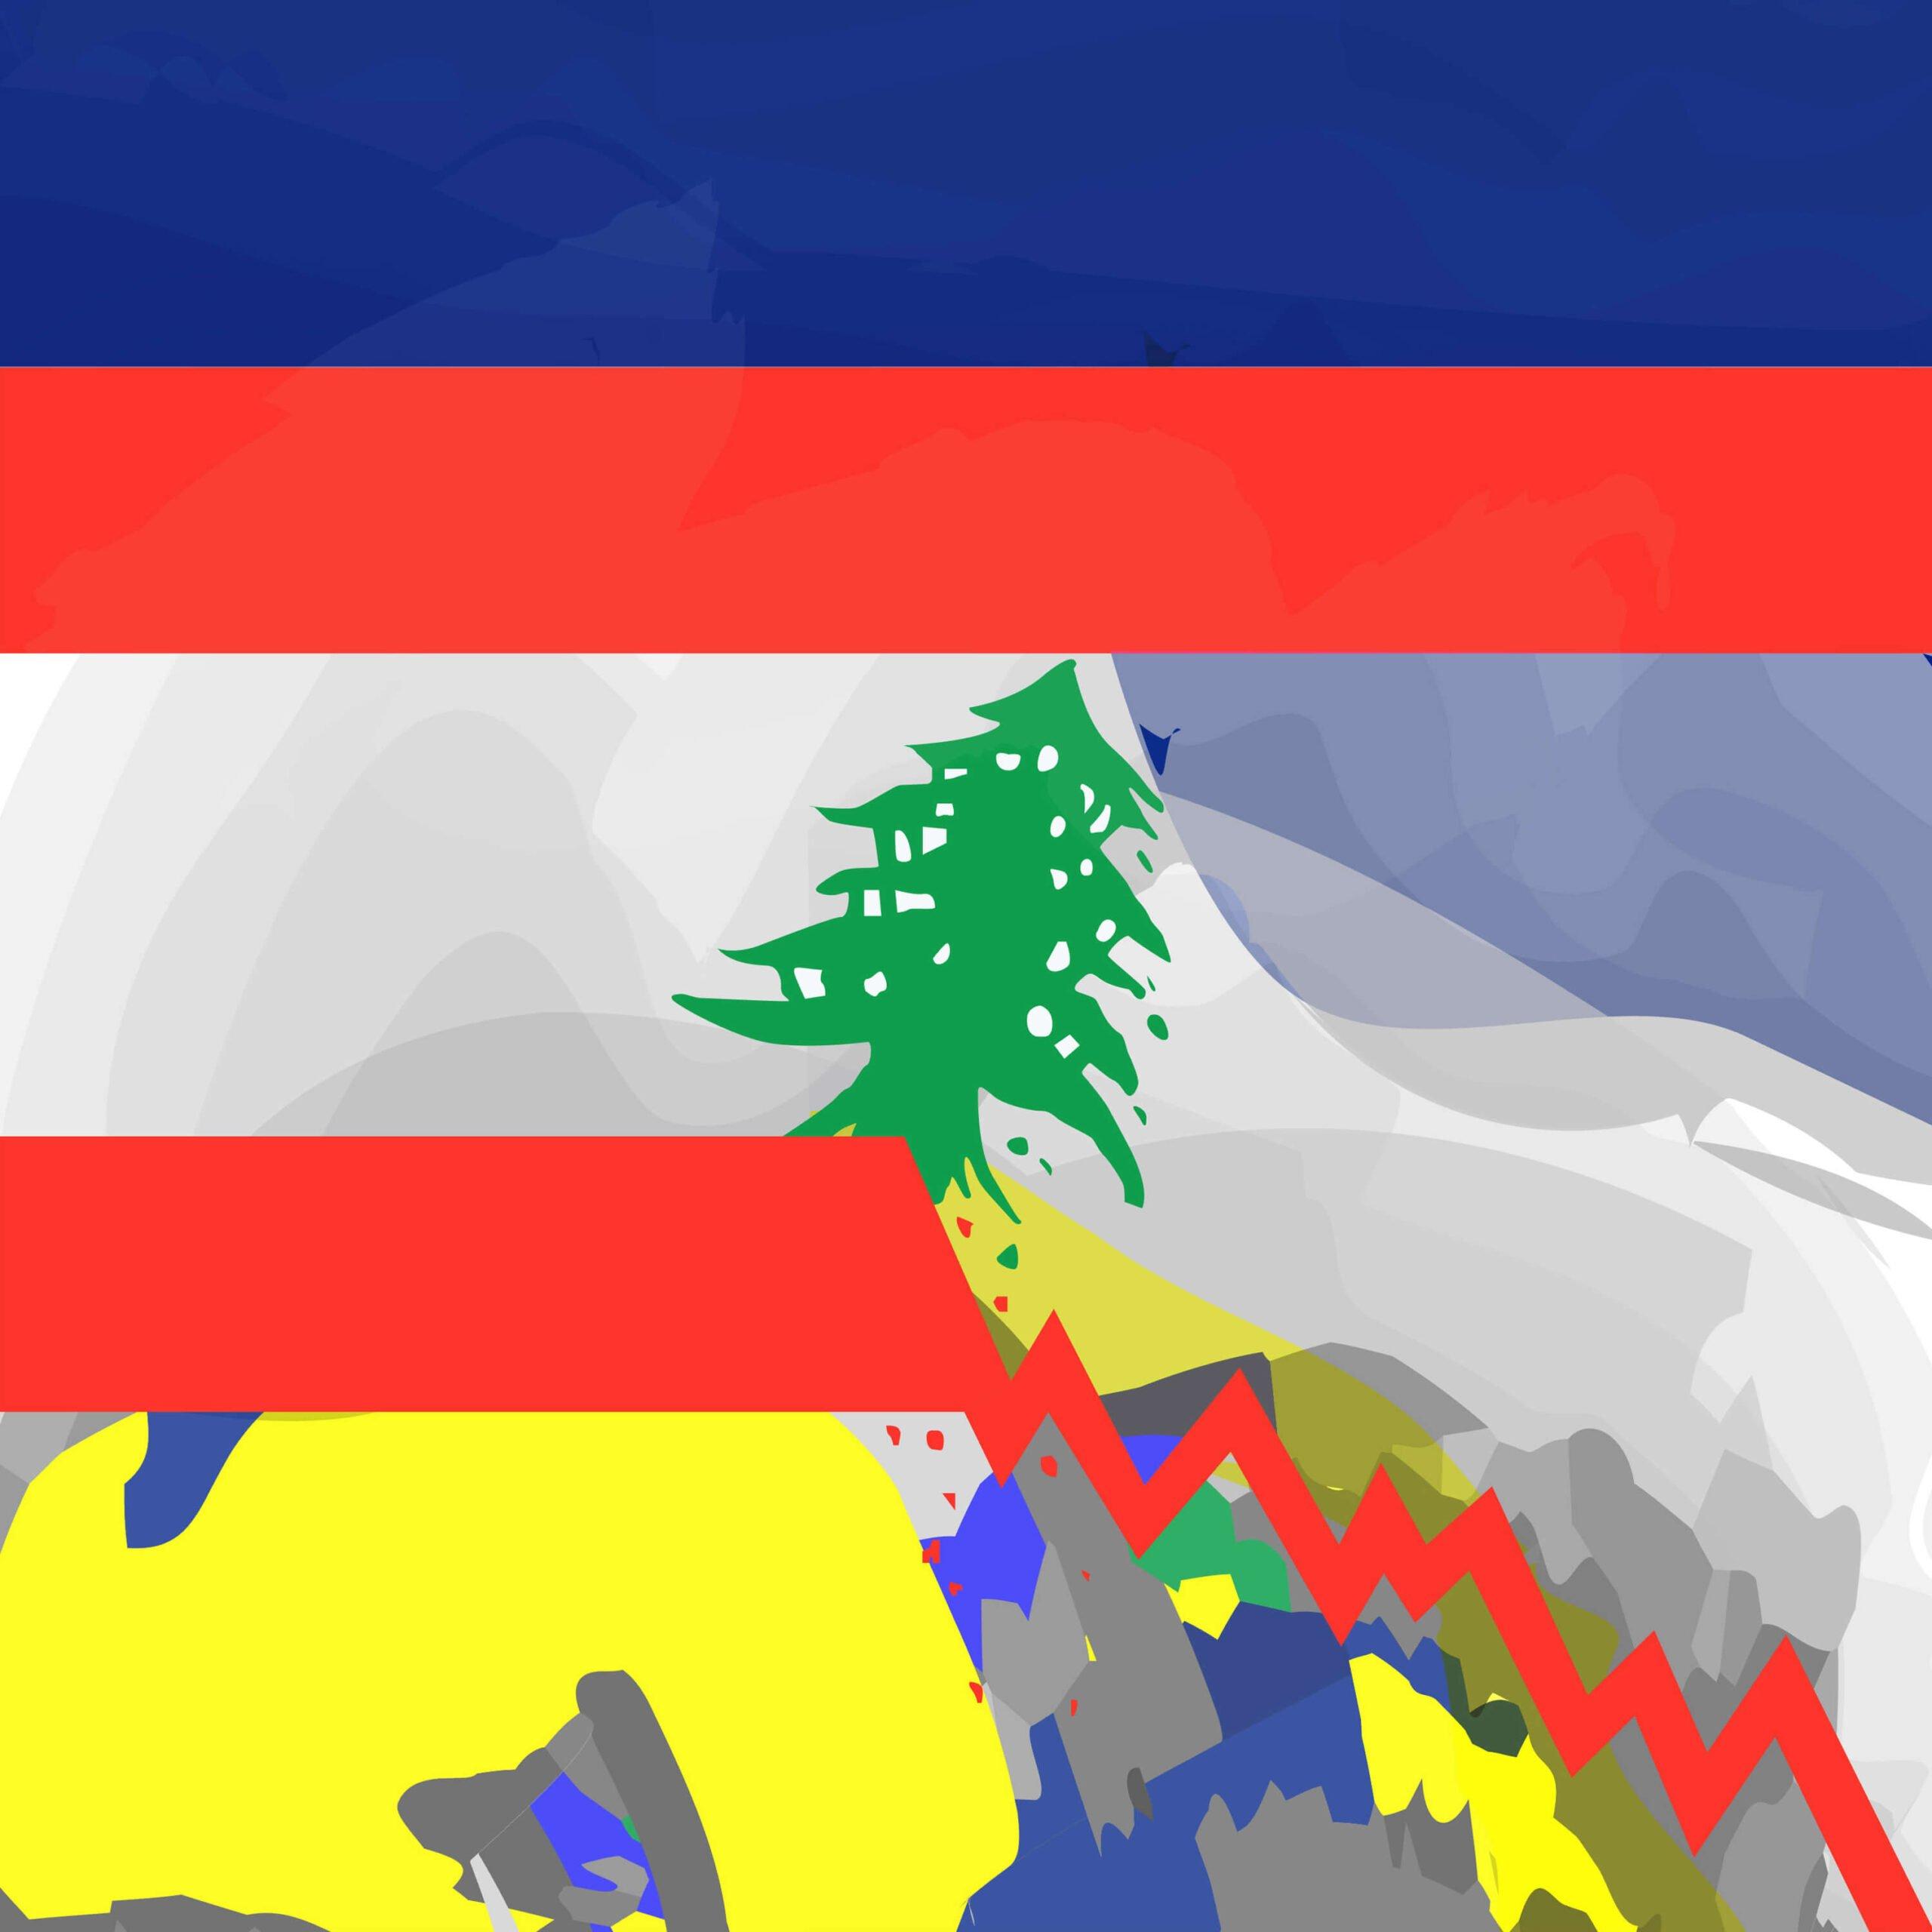 Lebanon illustration by Rita Azar